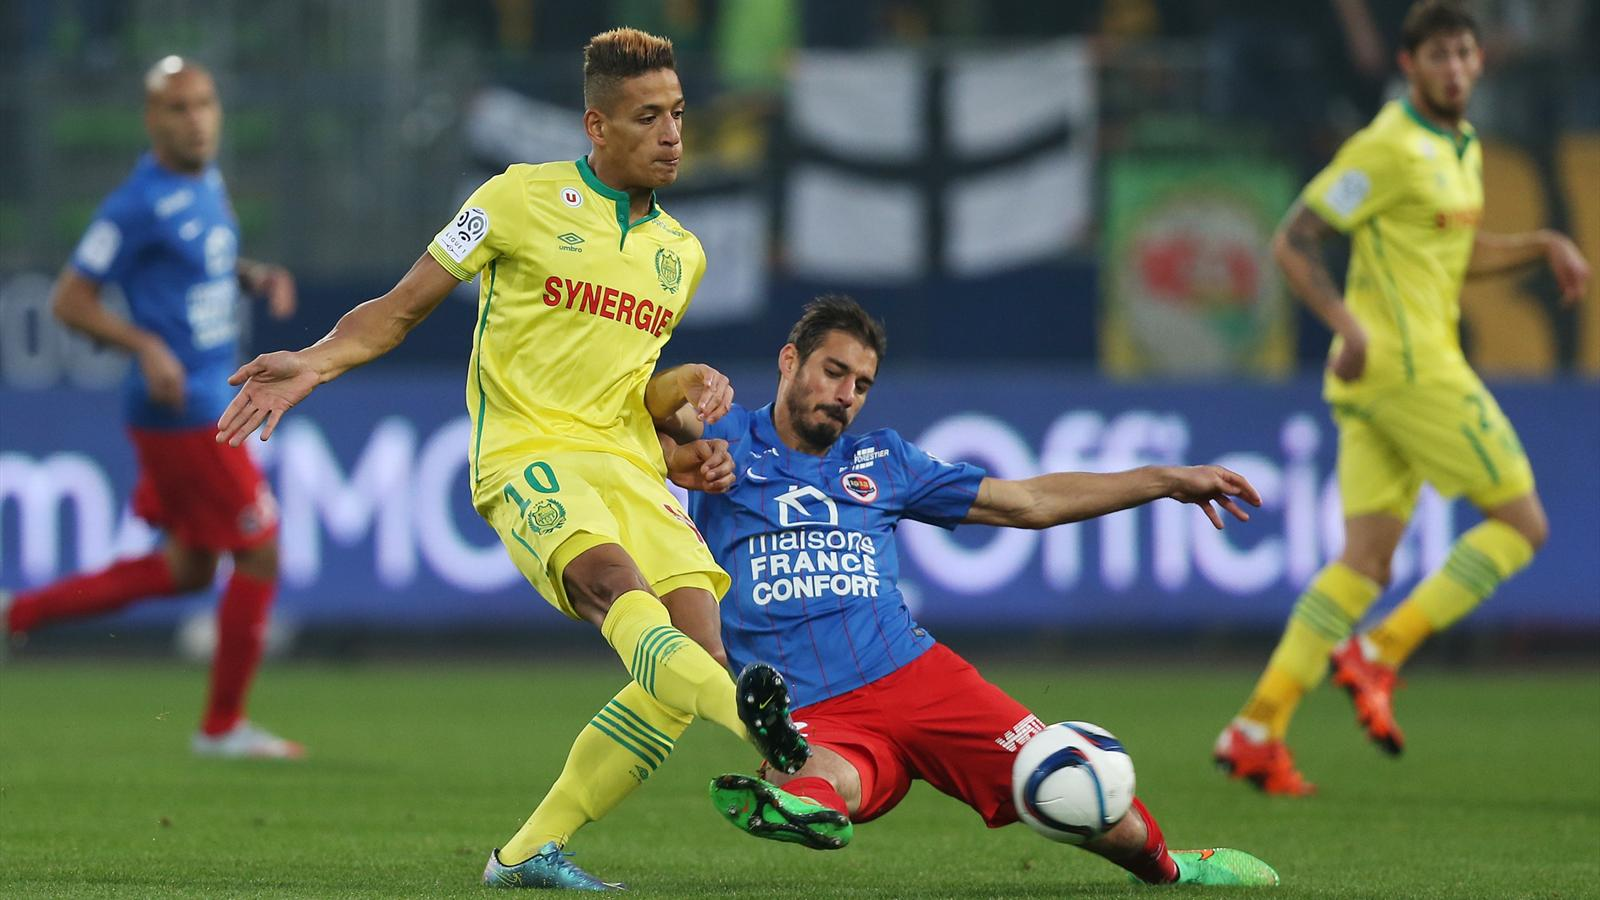 Nicolas Seube tacle Yacine Bammou lors de Caen-Nantes